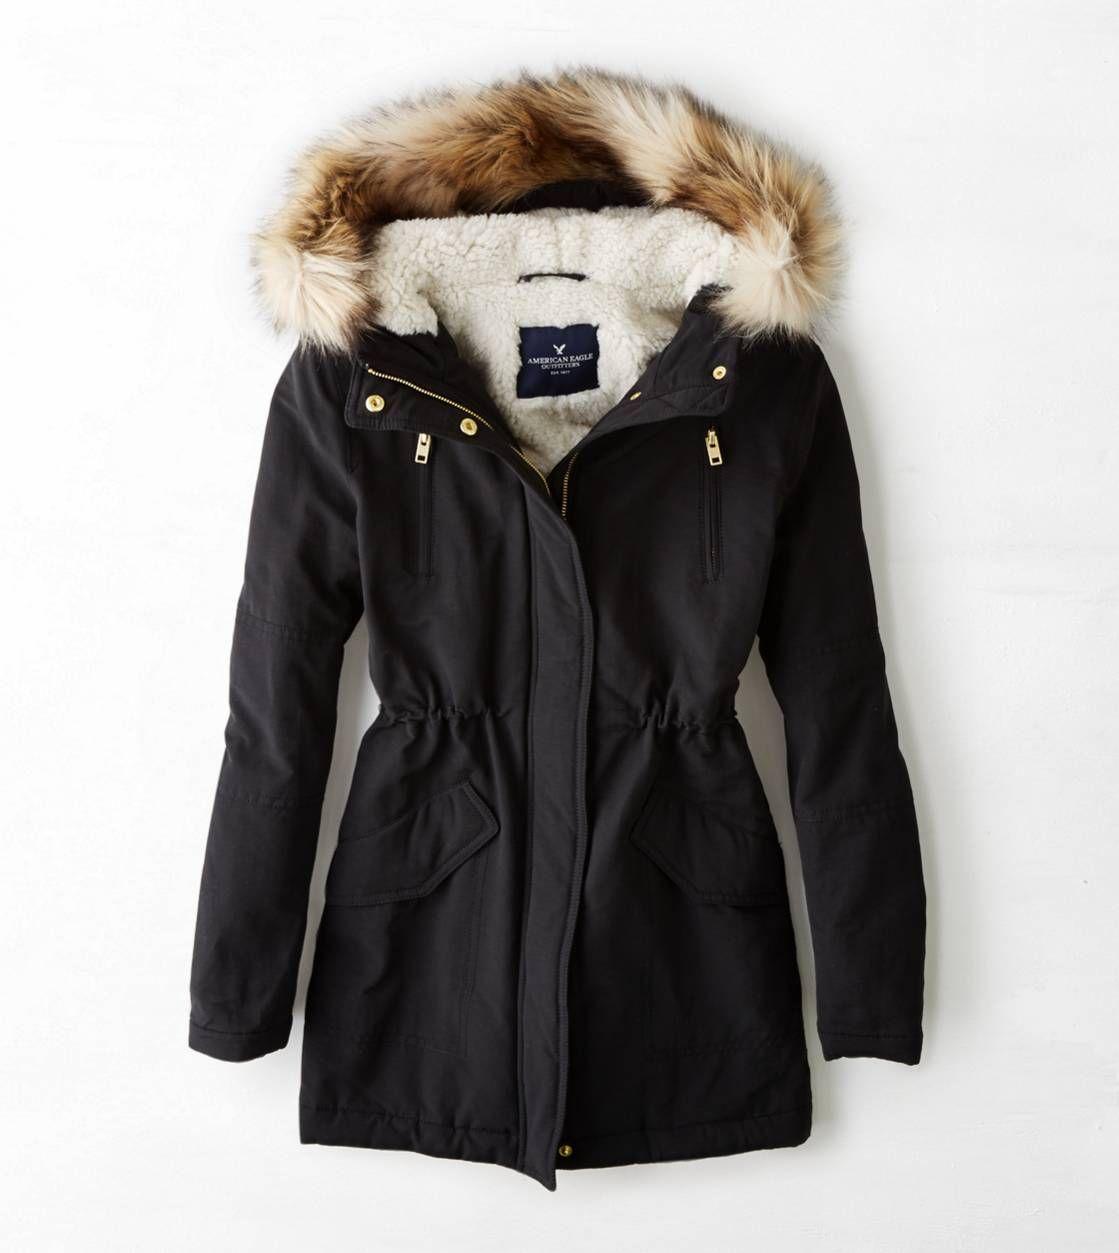 Aeo Cinched Surplus Parka True Black American Eagle Outfitters Black Winter Jacket Black Winter Coat Winter Jackets [ 1253 x 1119 Pixel ]